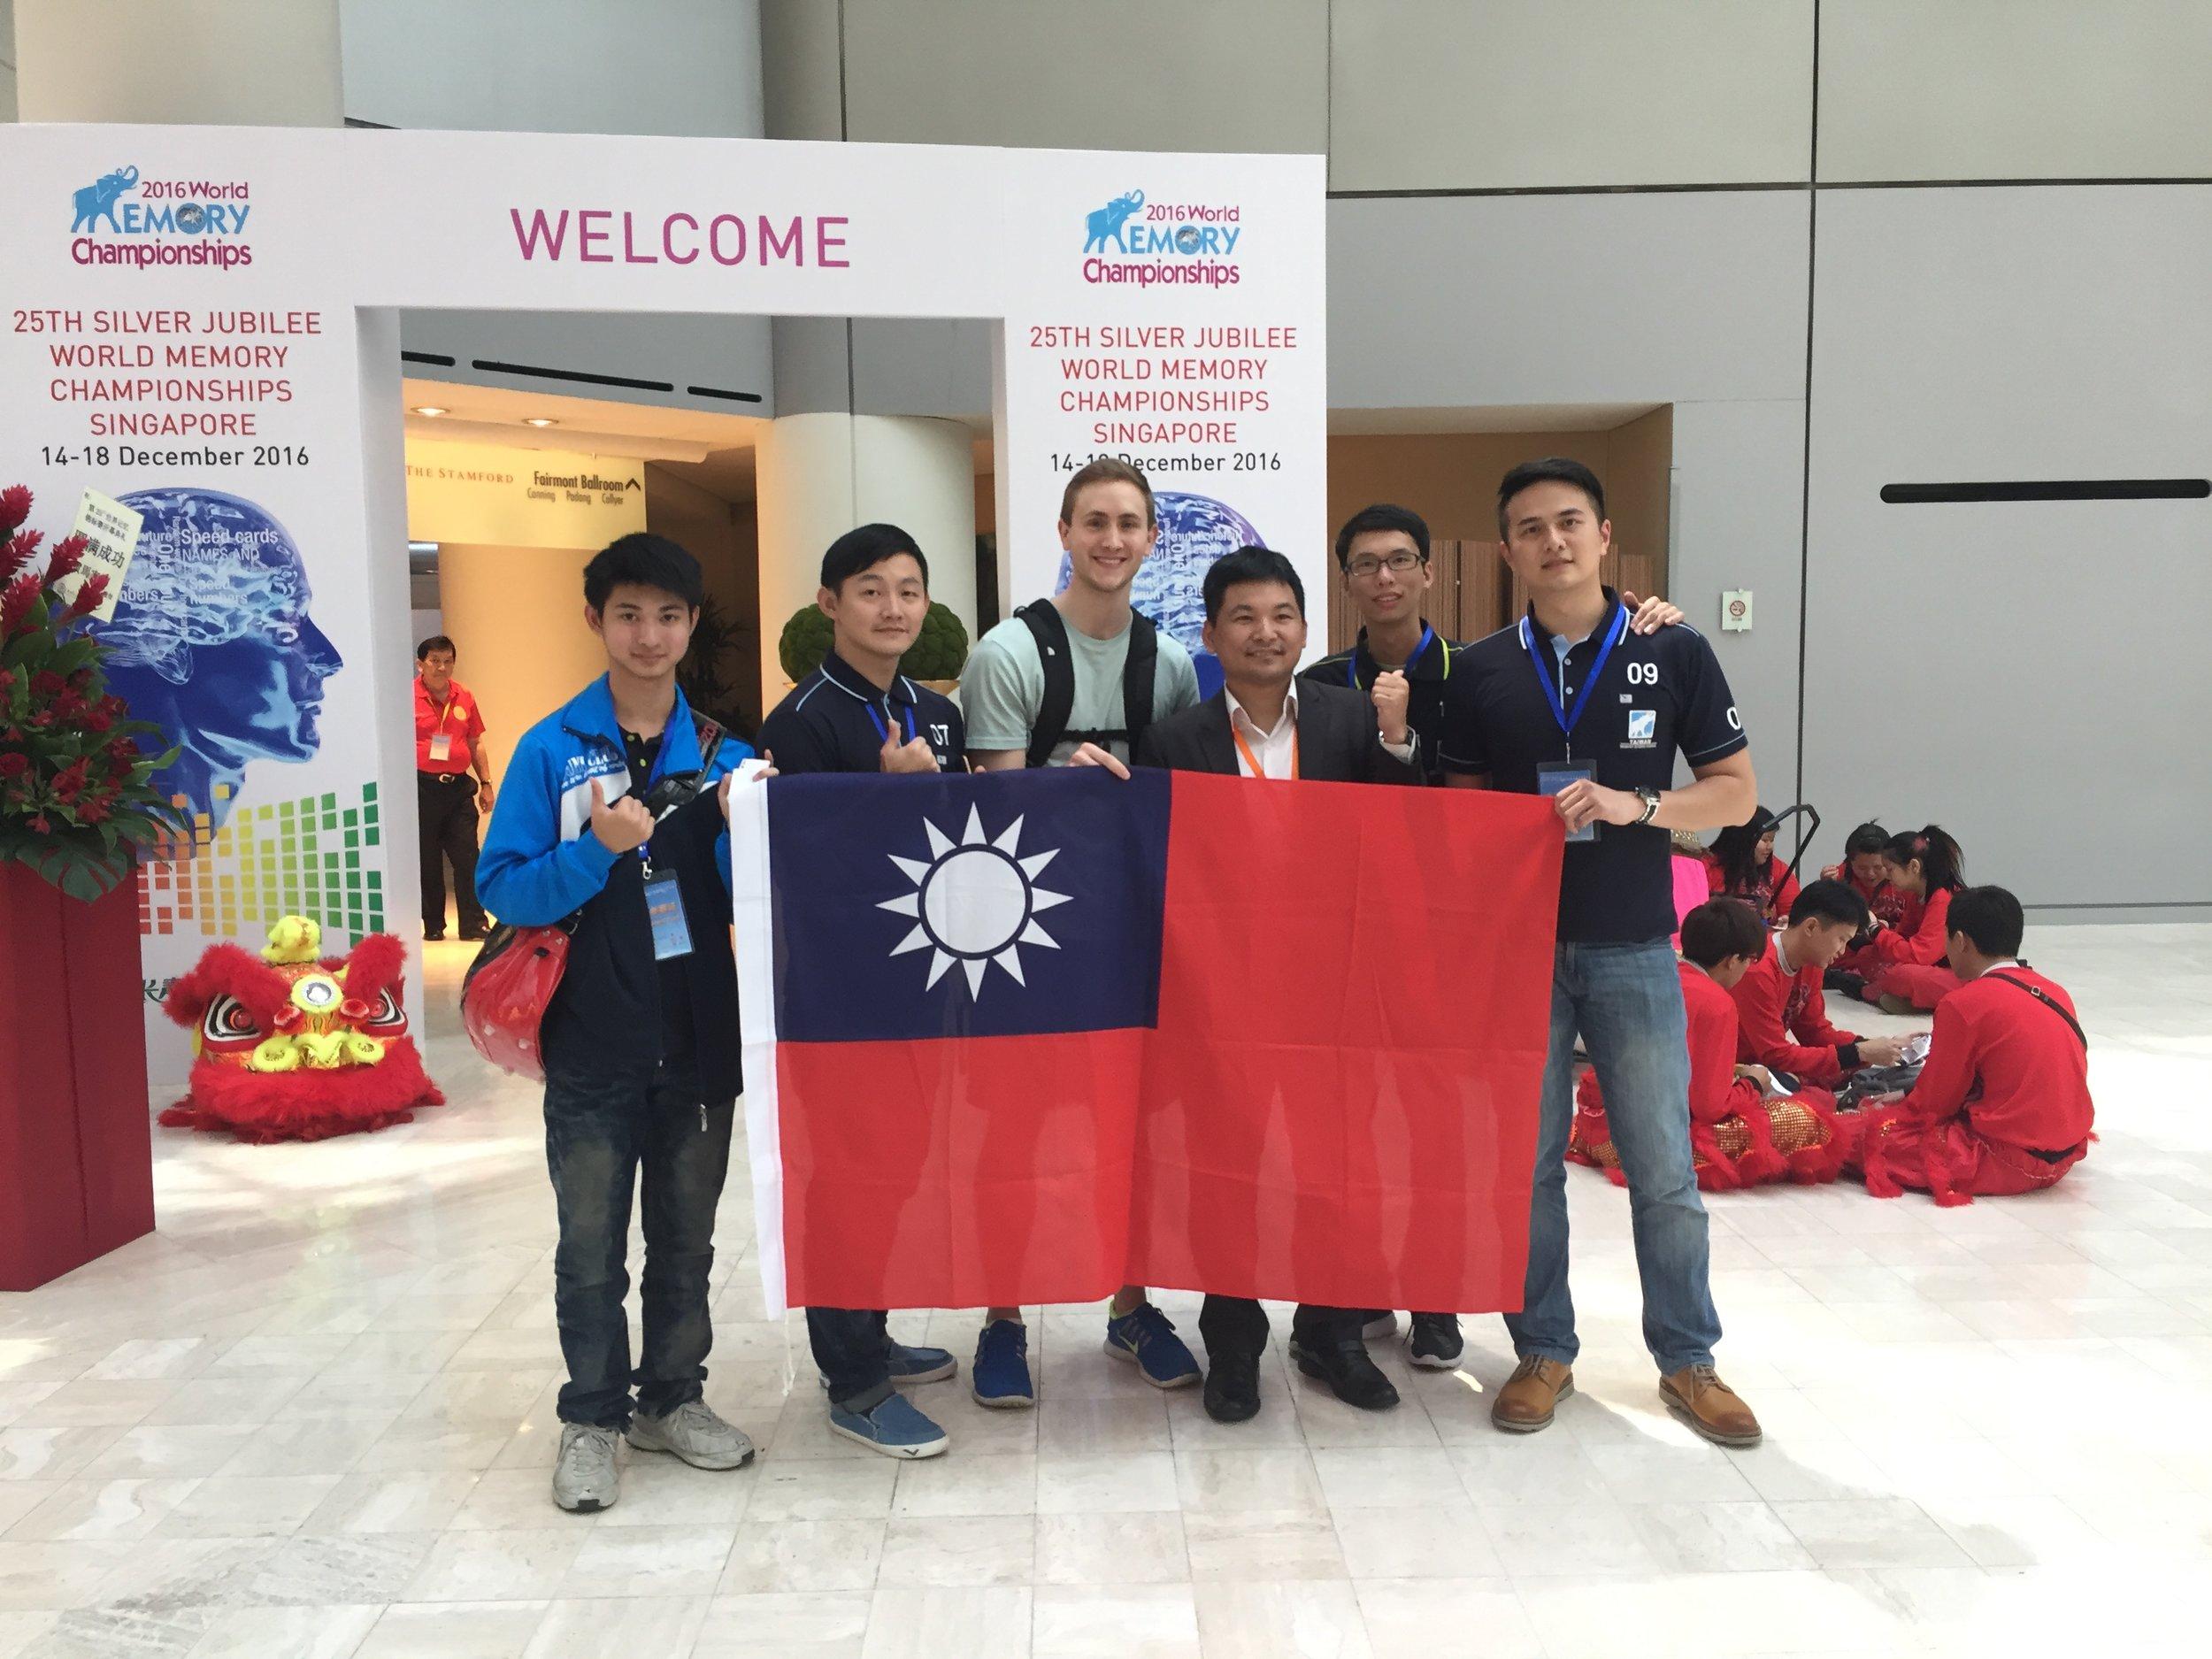 With Team Taiwan: Chunlin, Qingwan, Ken, Hungli, and Yuming